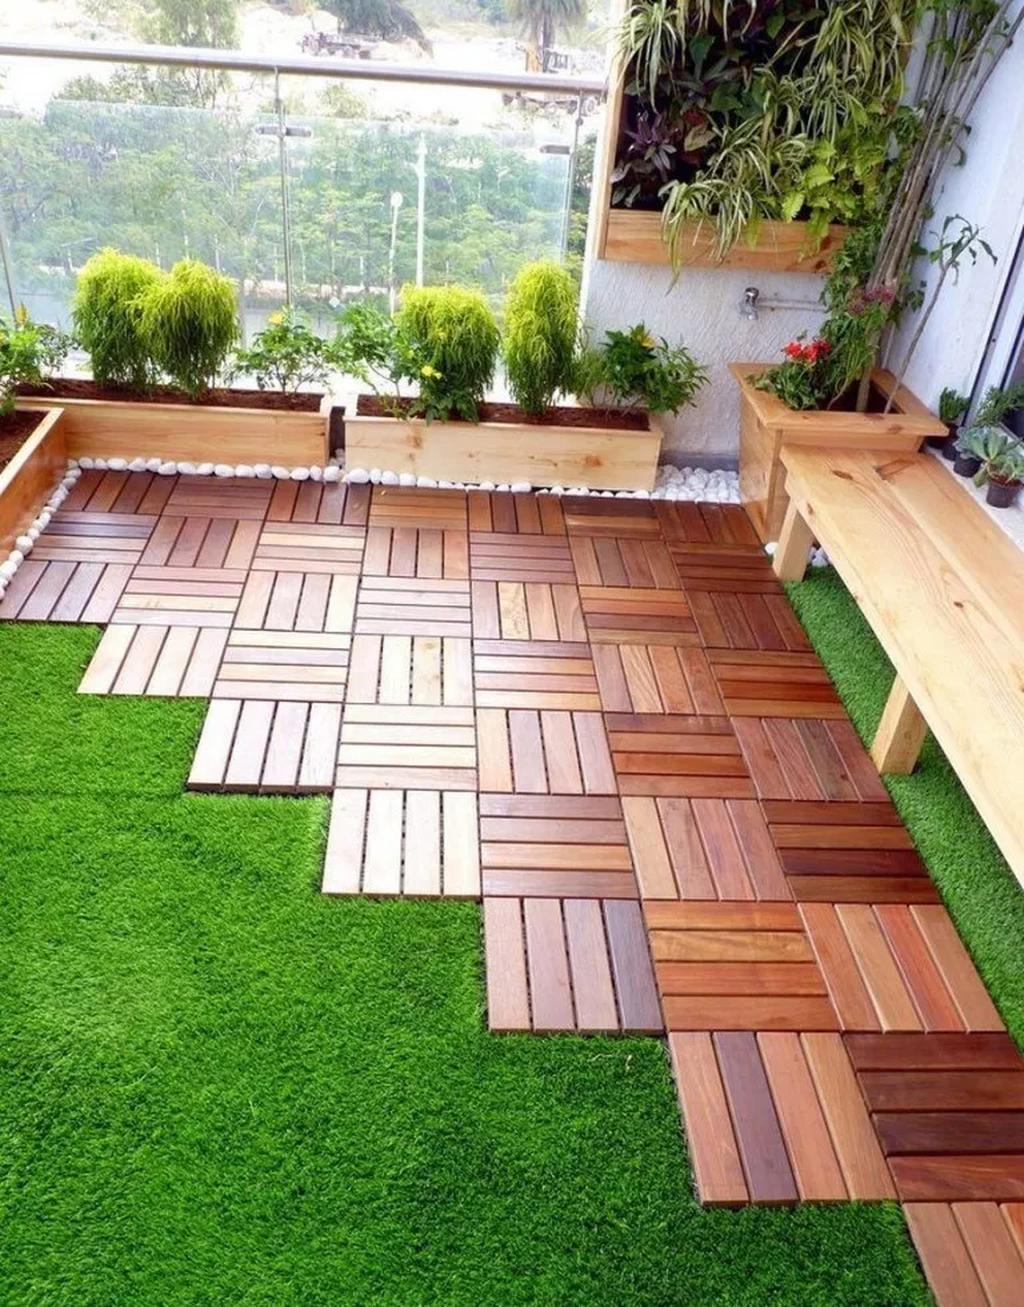 8 Small Apartment Balcony Garden Design Ideas You are in the